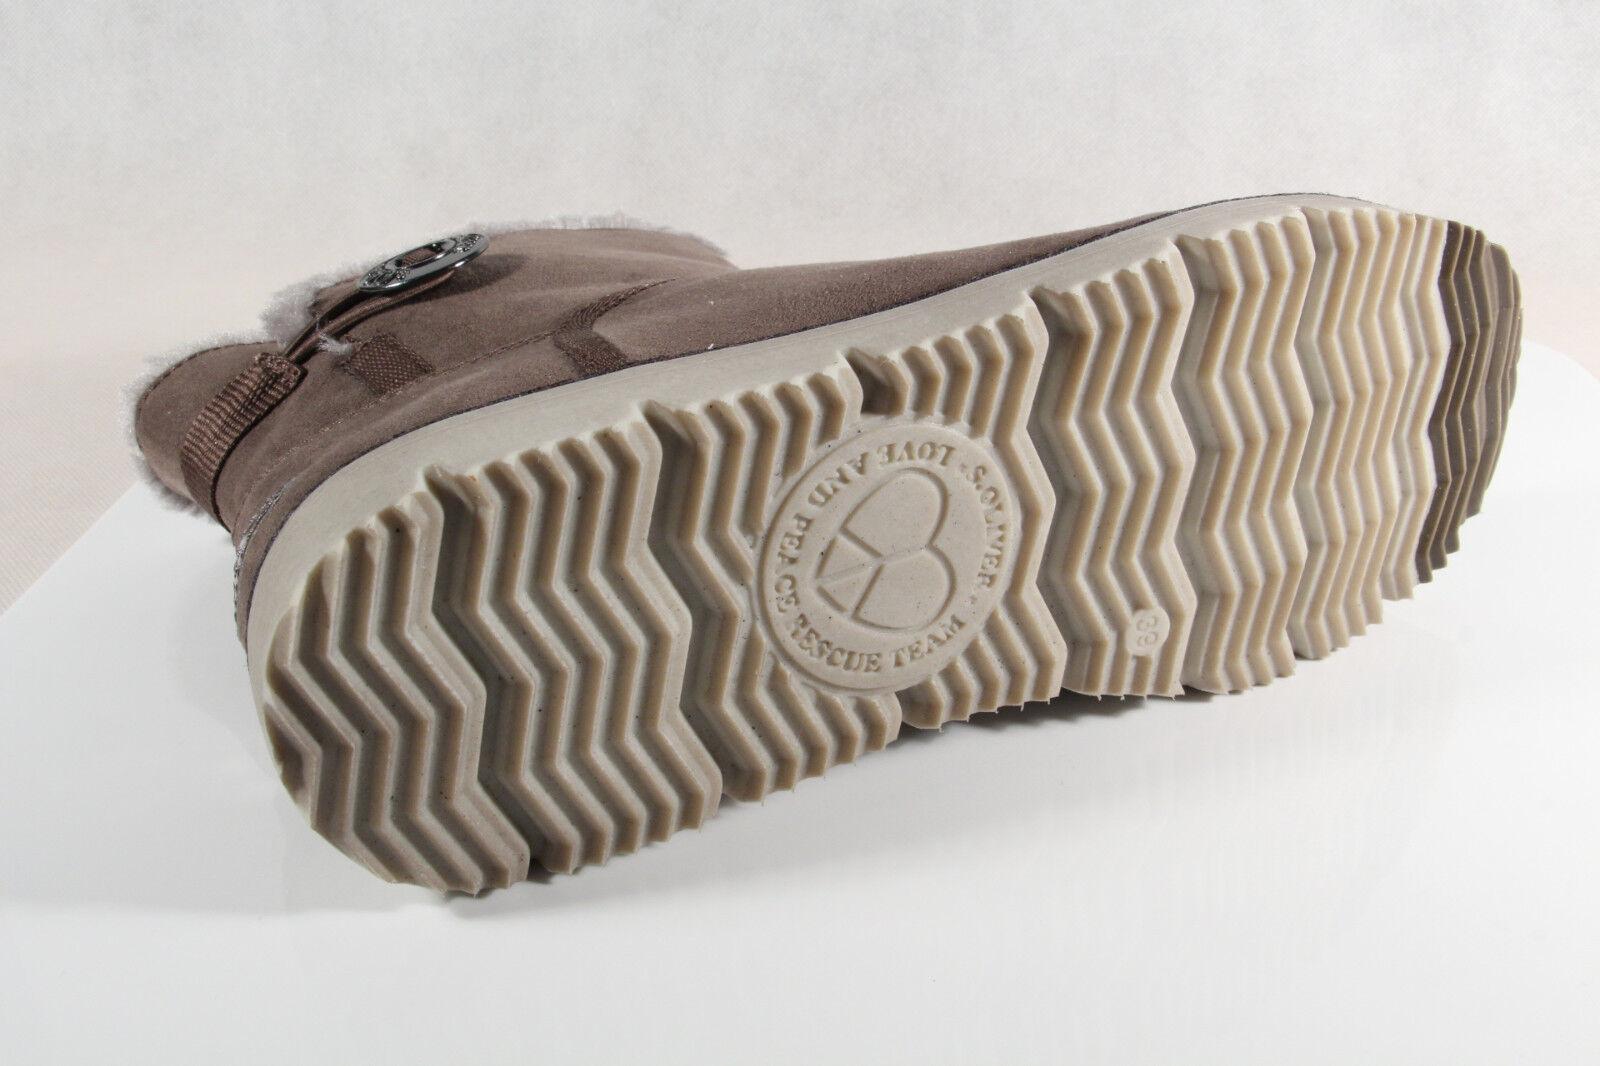 S.Oliver Damen Stiefel, Stiefelette, Stiefel  cigar/ grau 26412   NEU